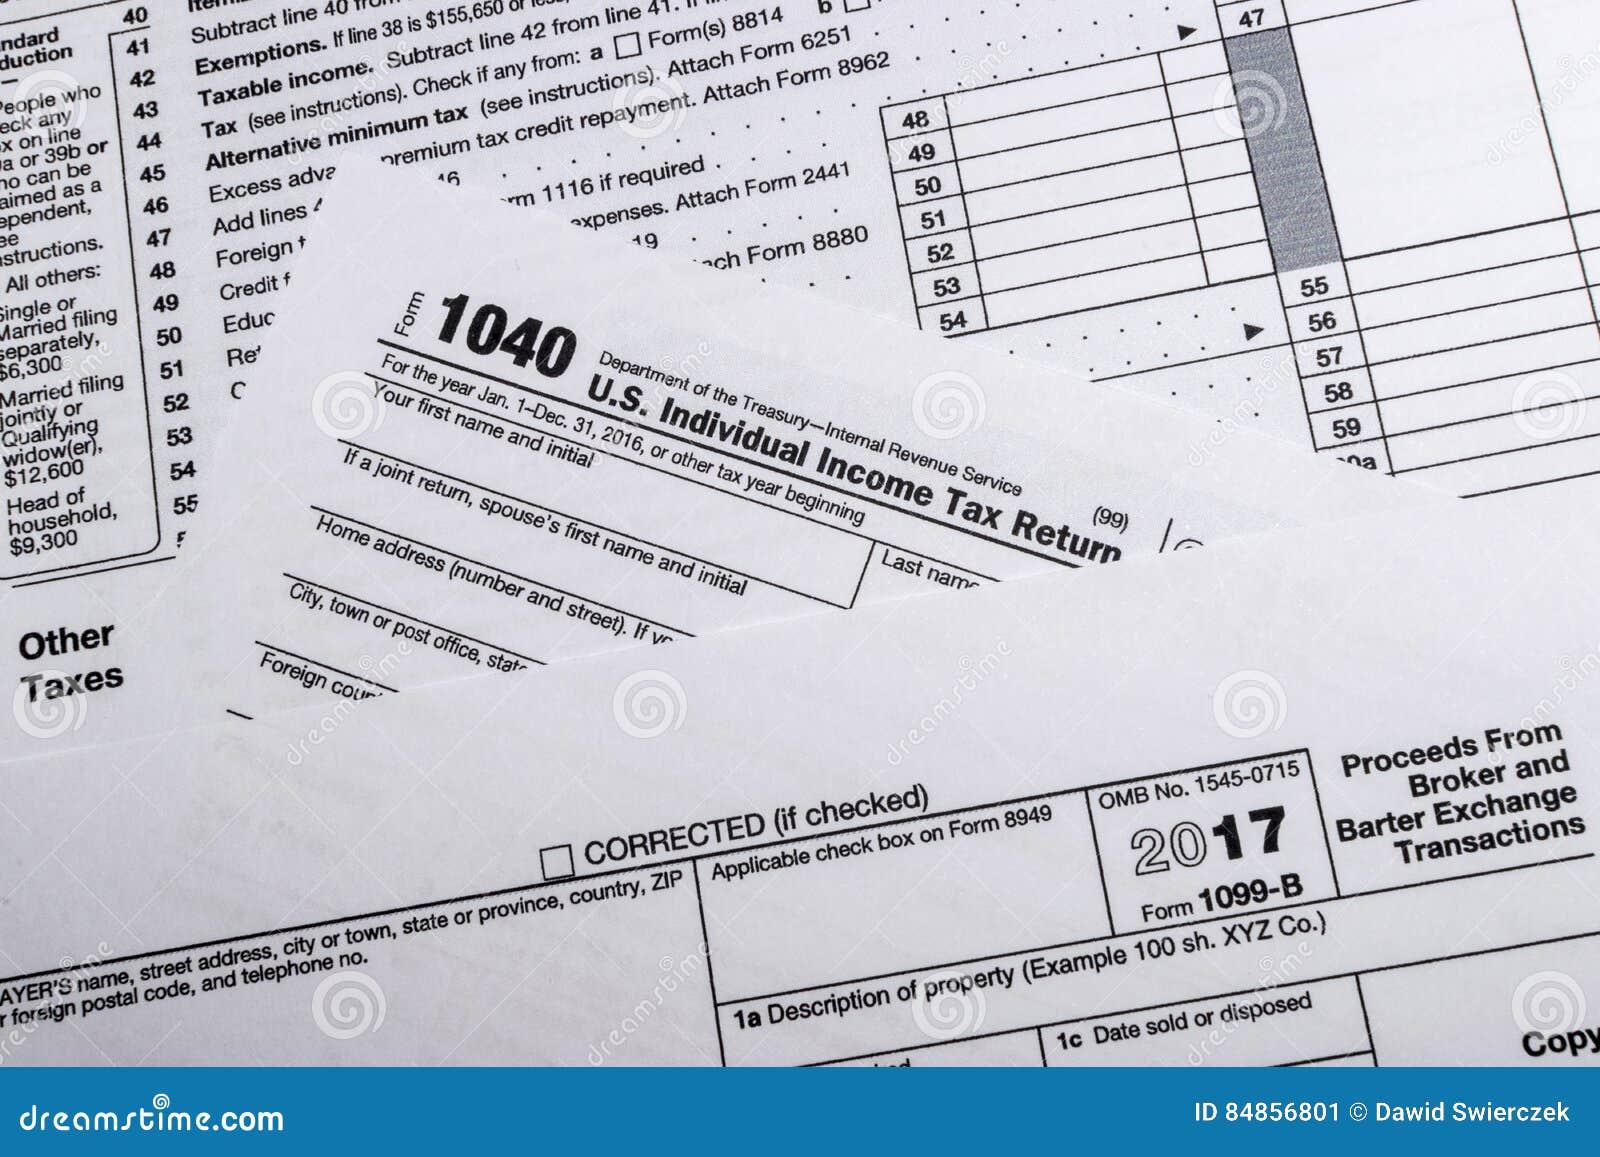 IRS Form 1099-B: Proceeds Frim Broker And Barter Exchange Transa ...